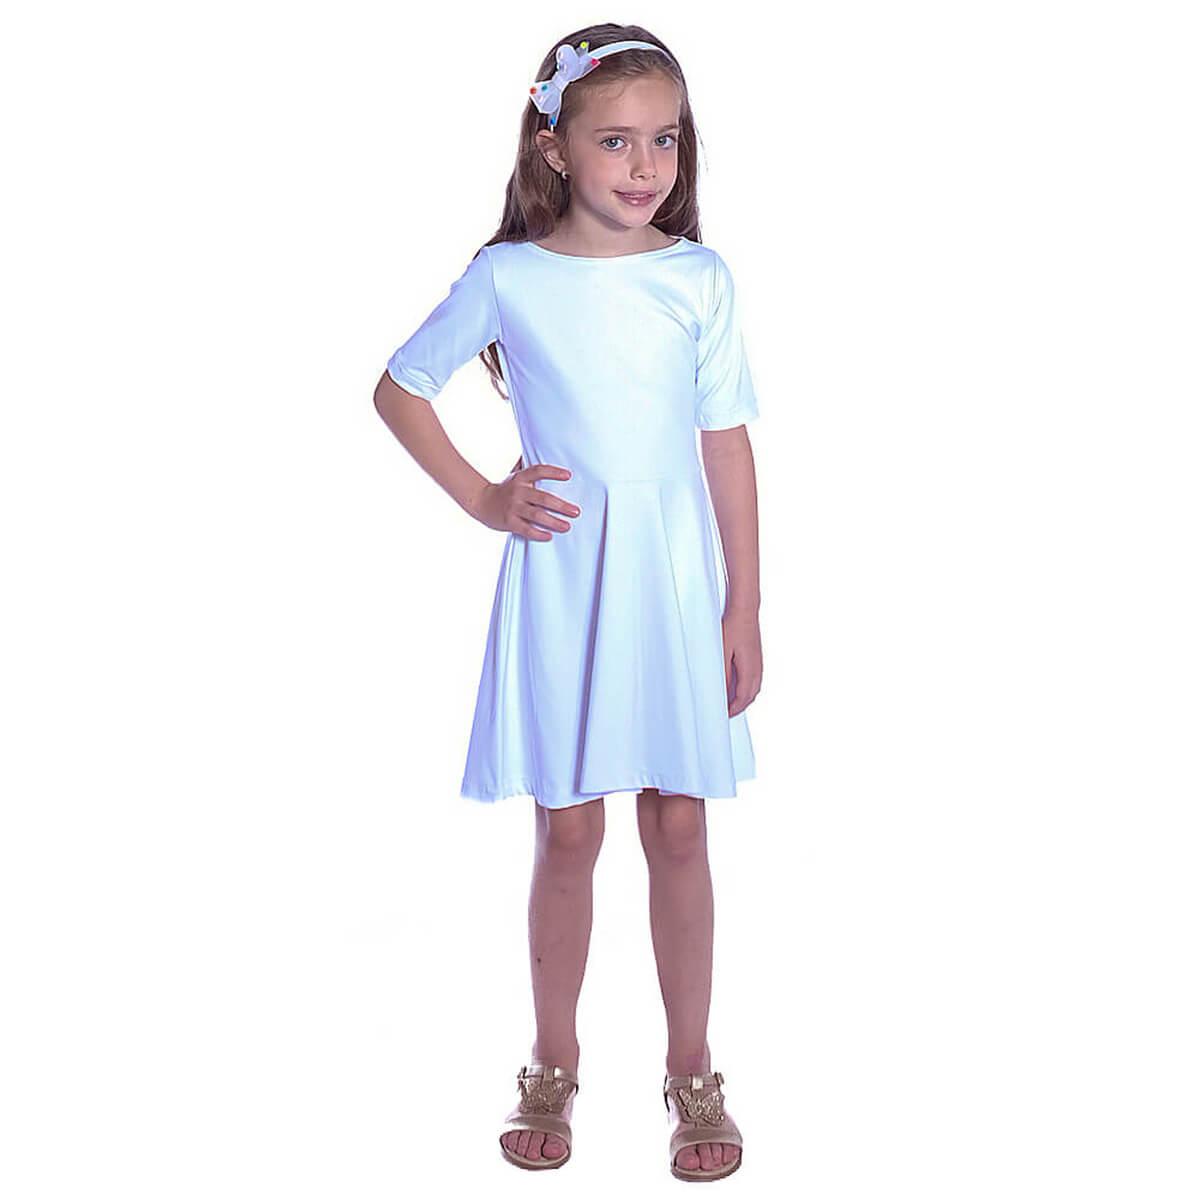 Vestido Infantil Branco Meia Manga Decote Canoa